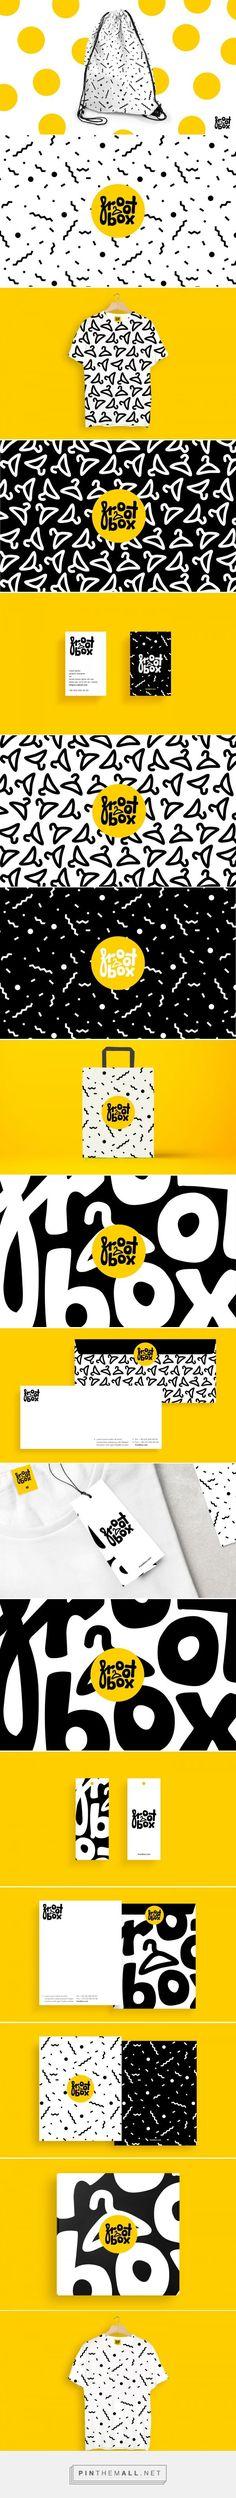 Frootbox Branding by Nuket Guner Corlan